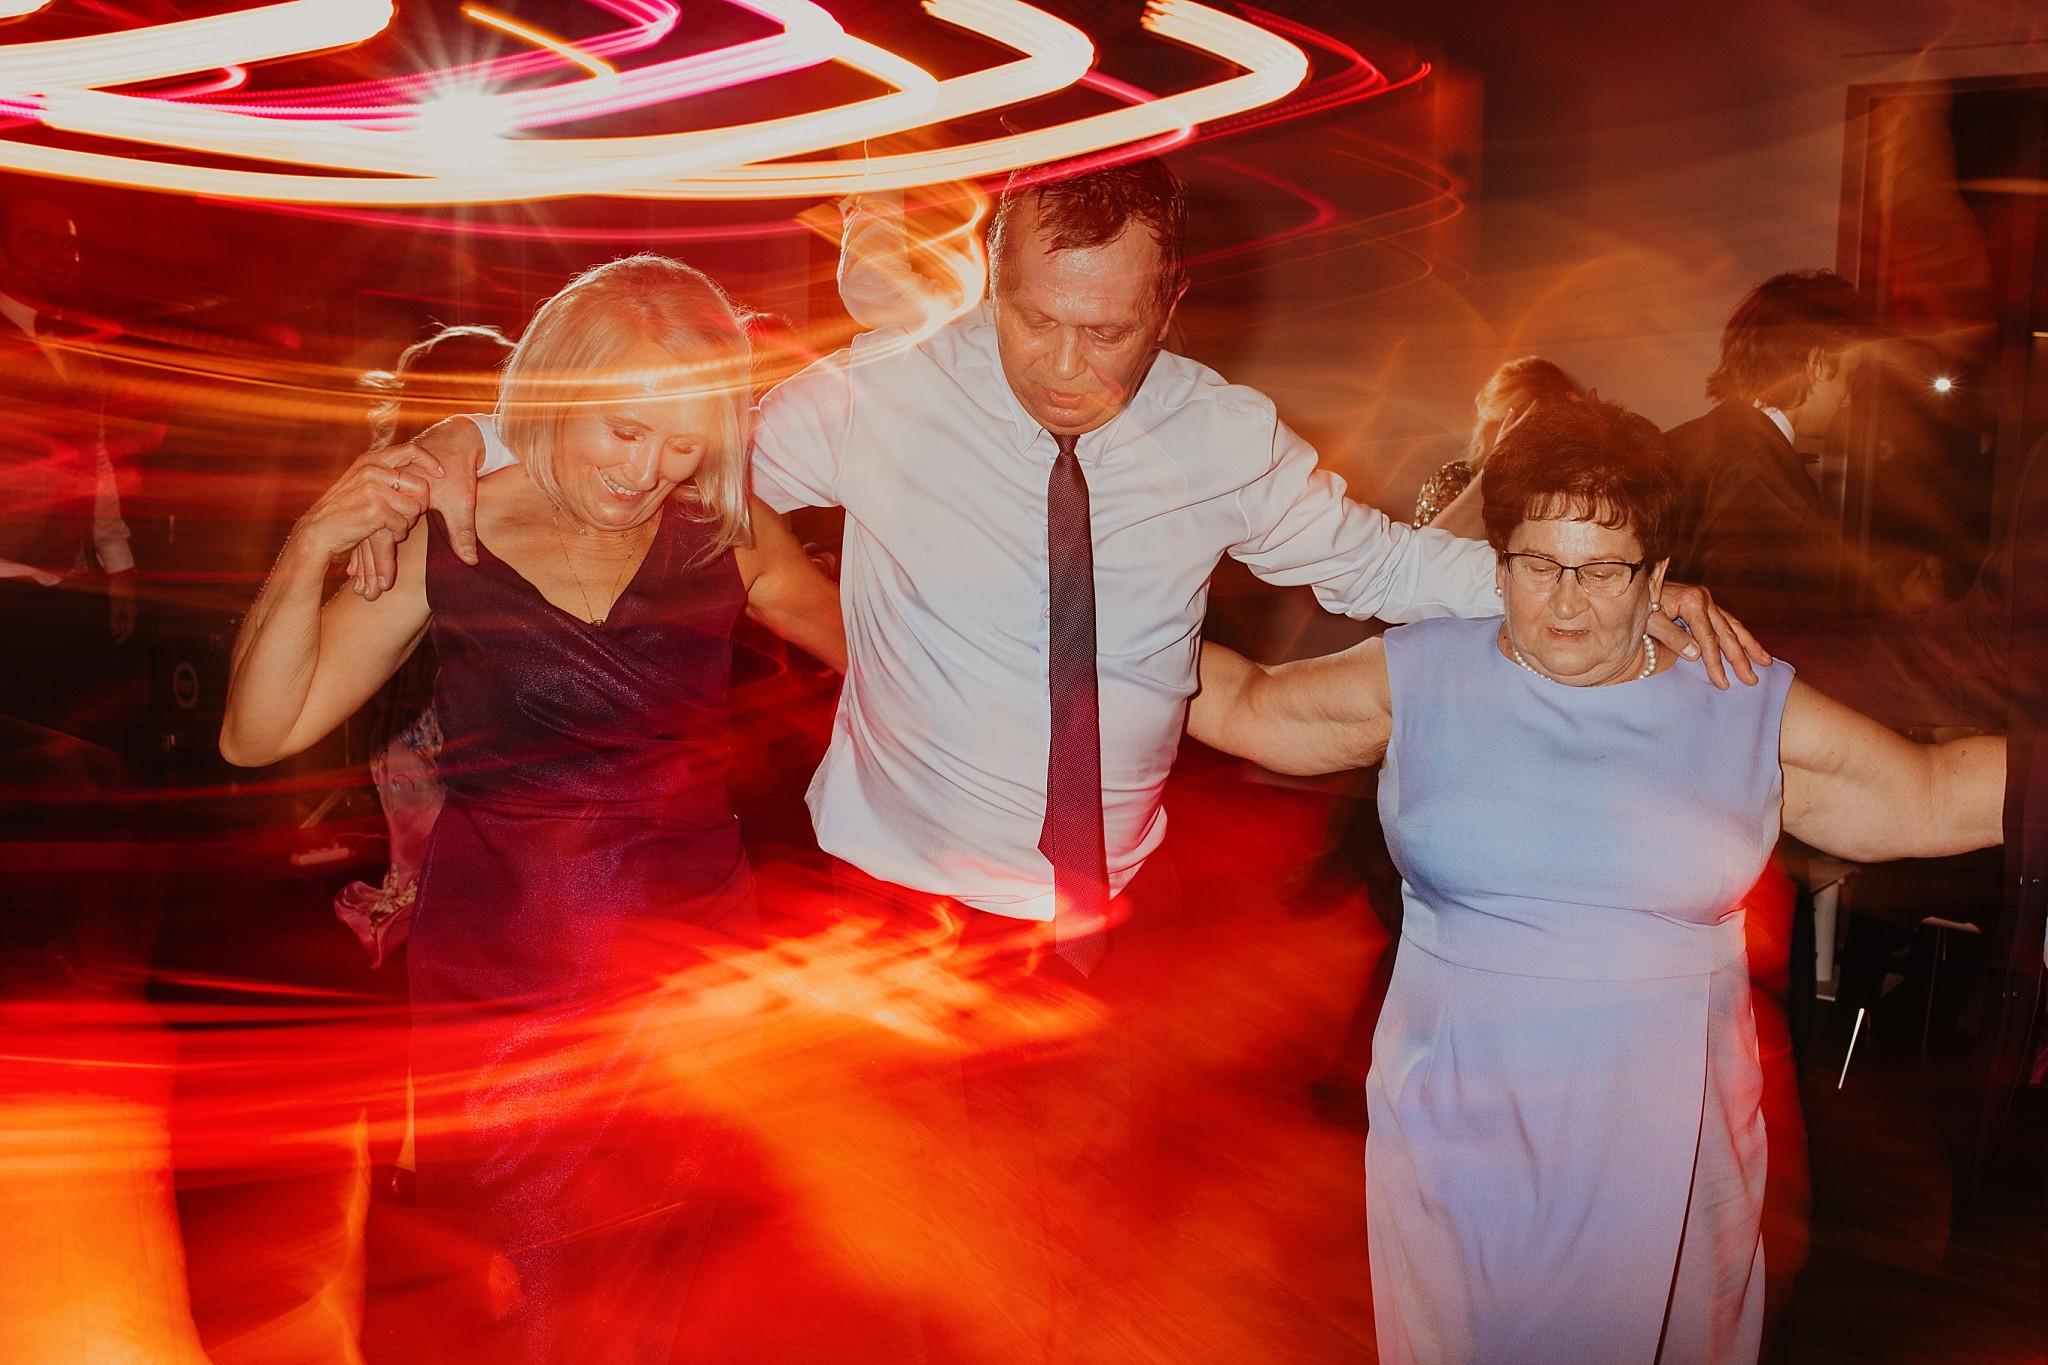 fotograf poznan wesele dobra truskawka piekne wesele pod poznaniem wesele w dobrej truskawce piekna para mloda slub marzen slub koronawirus slub listopad wesele koronawirus 434